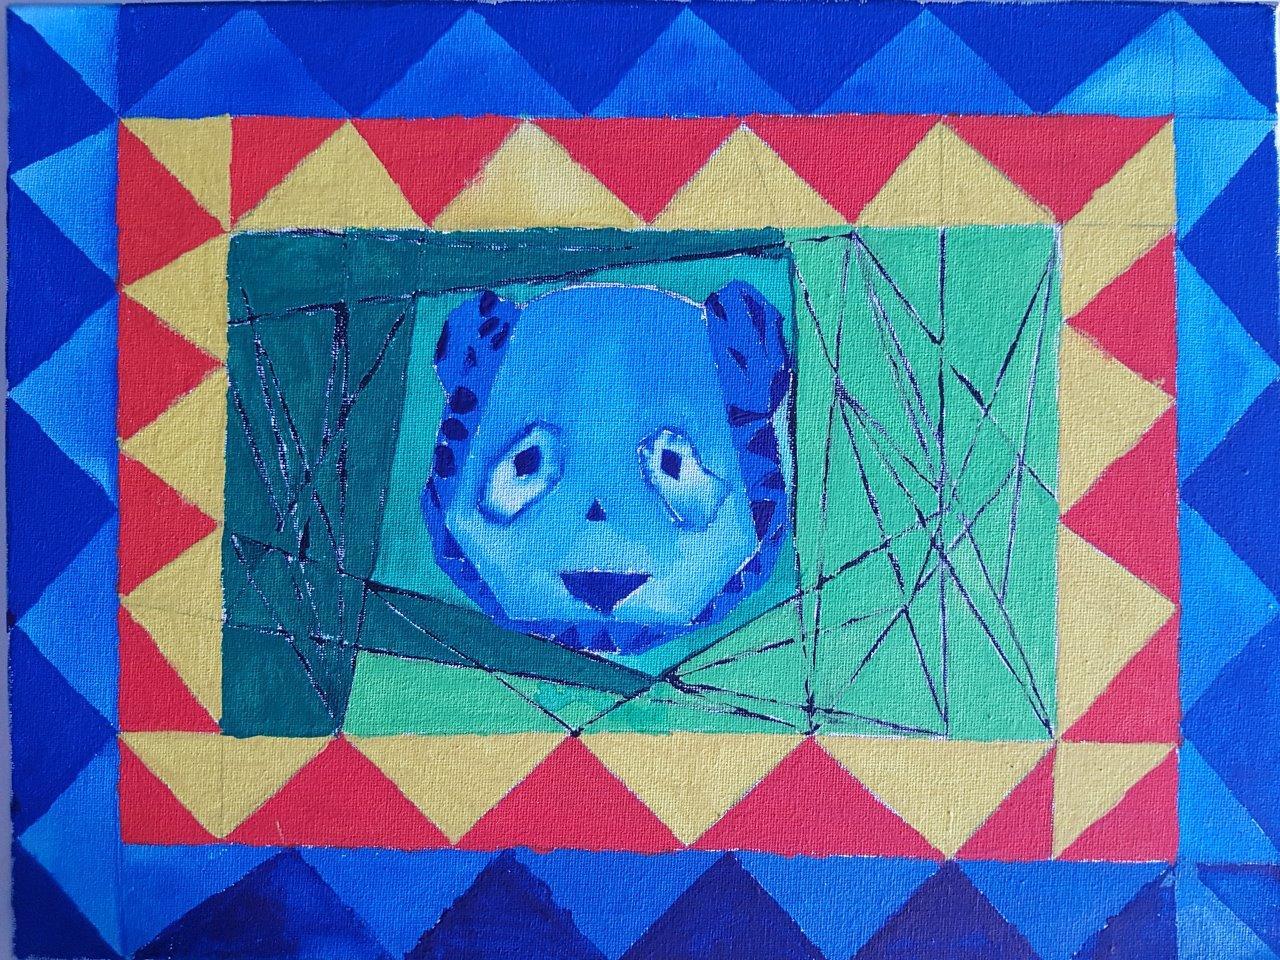 18-05-projet-arts-plastiques (4)